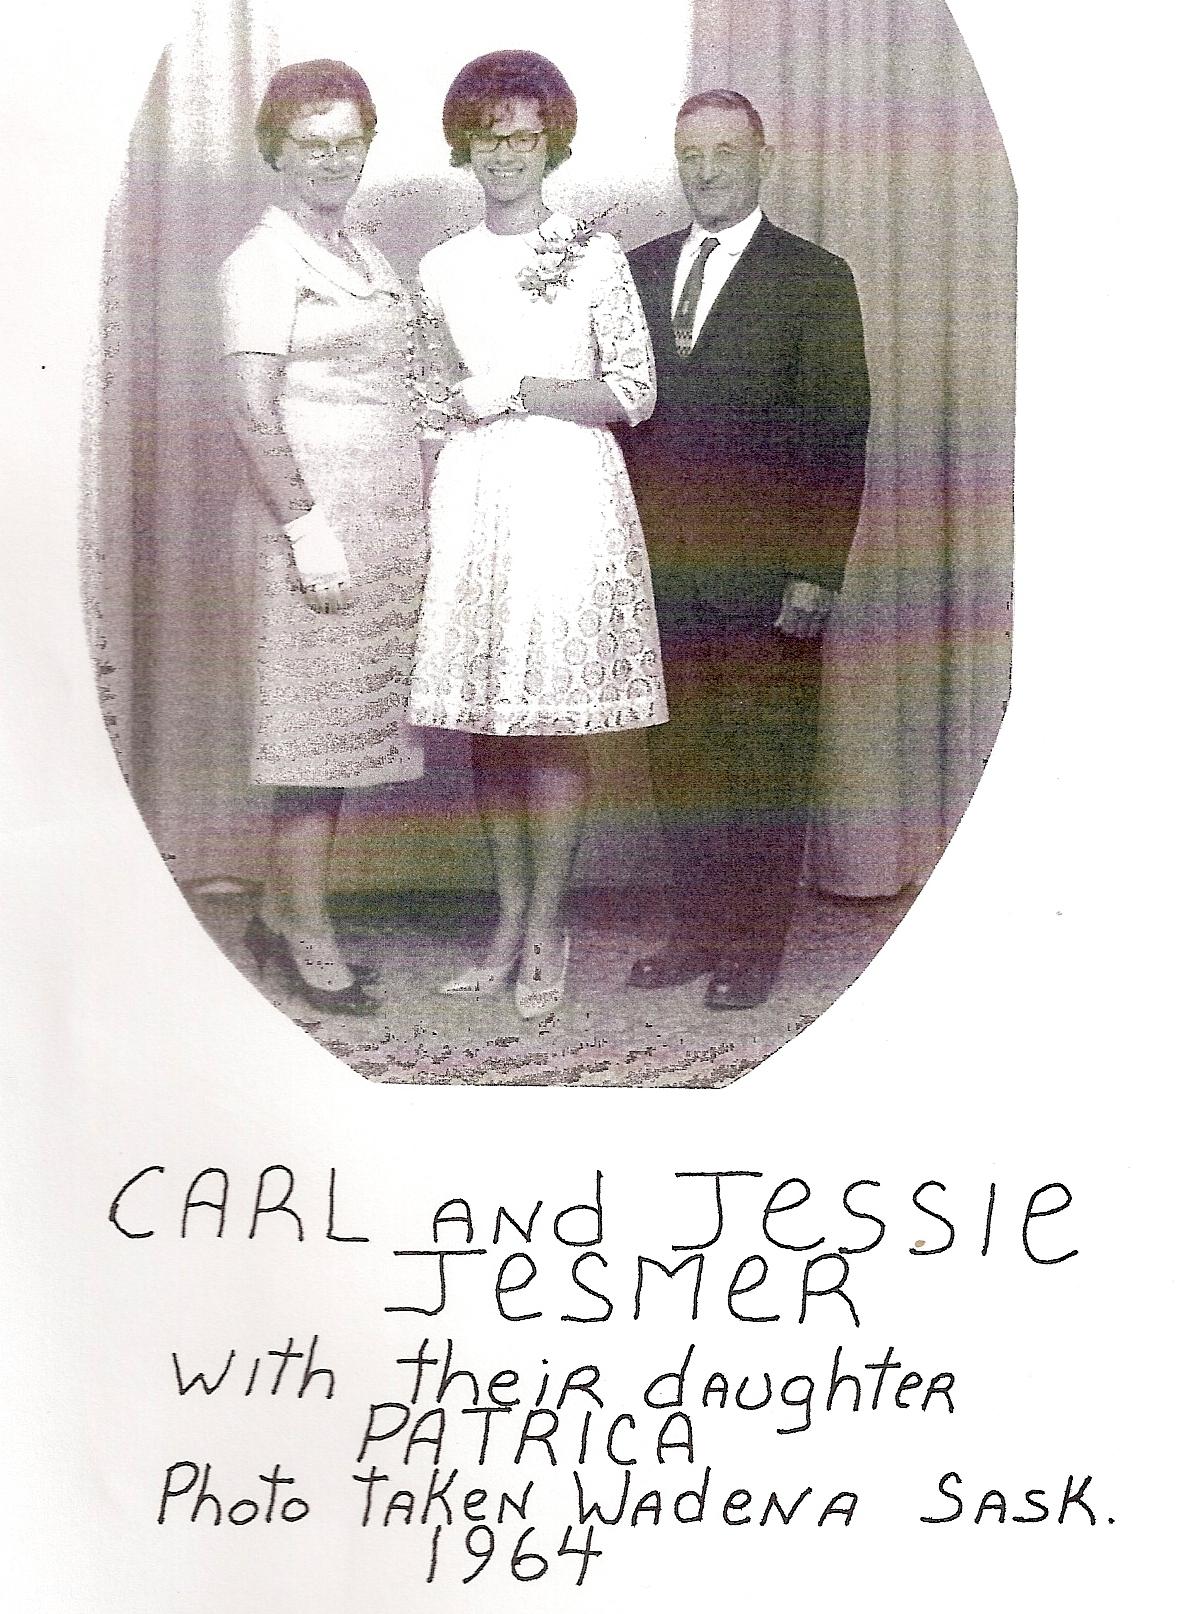 2-Carl and Jesse 1964